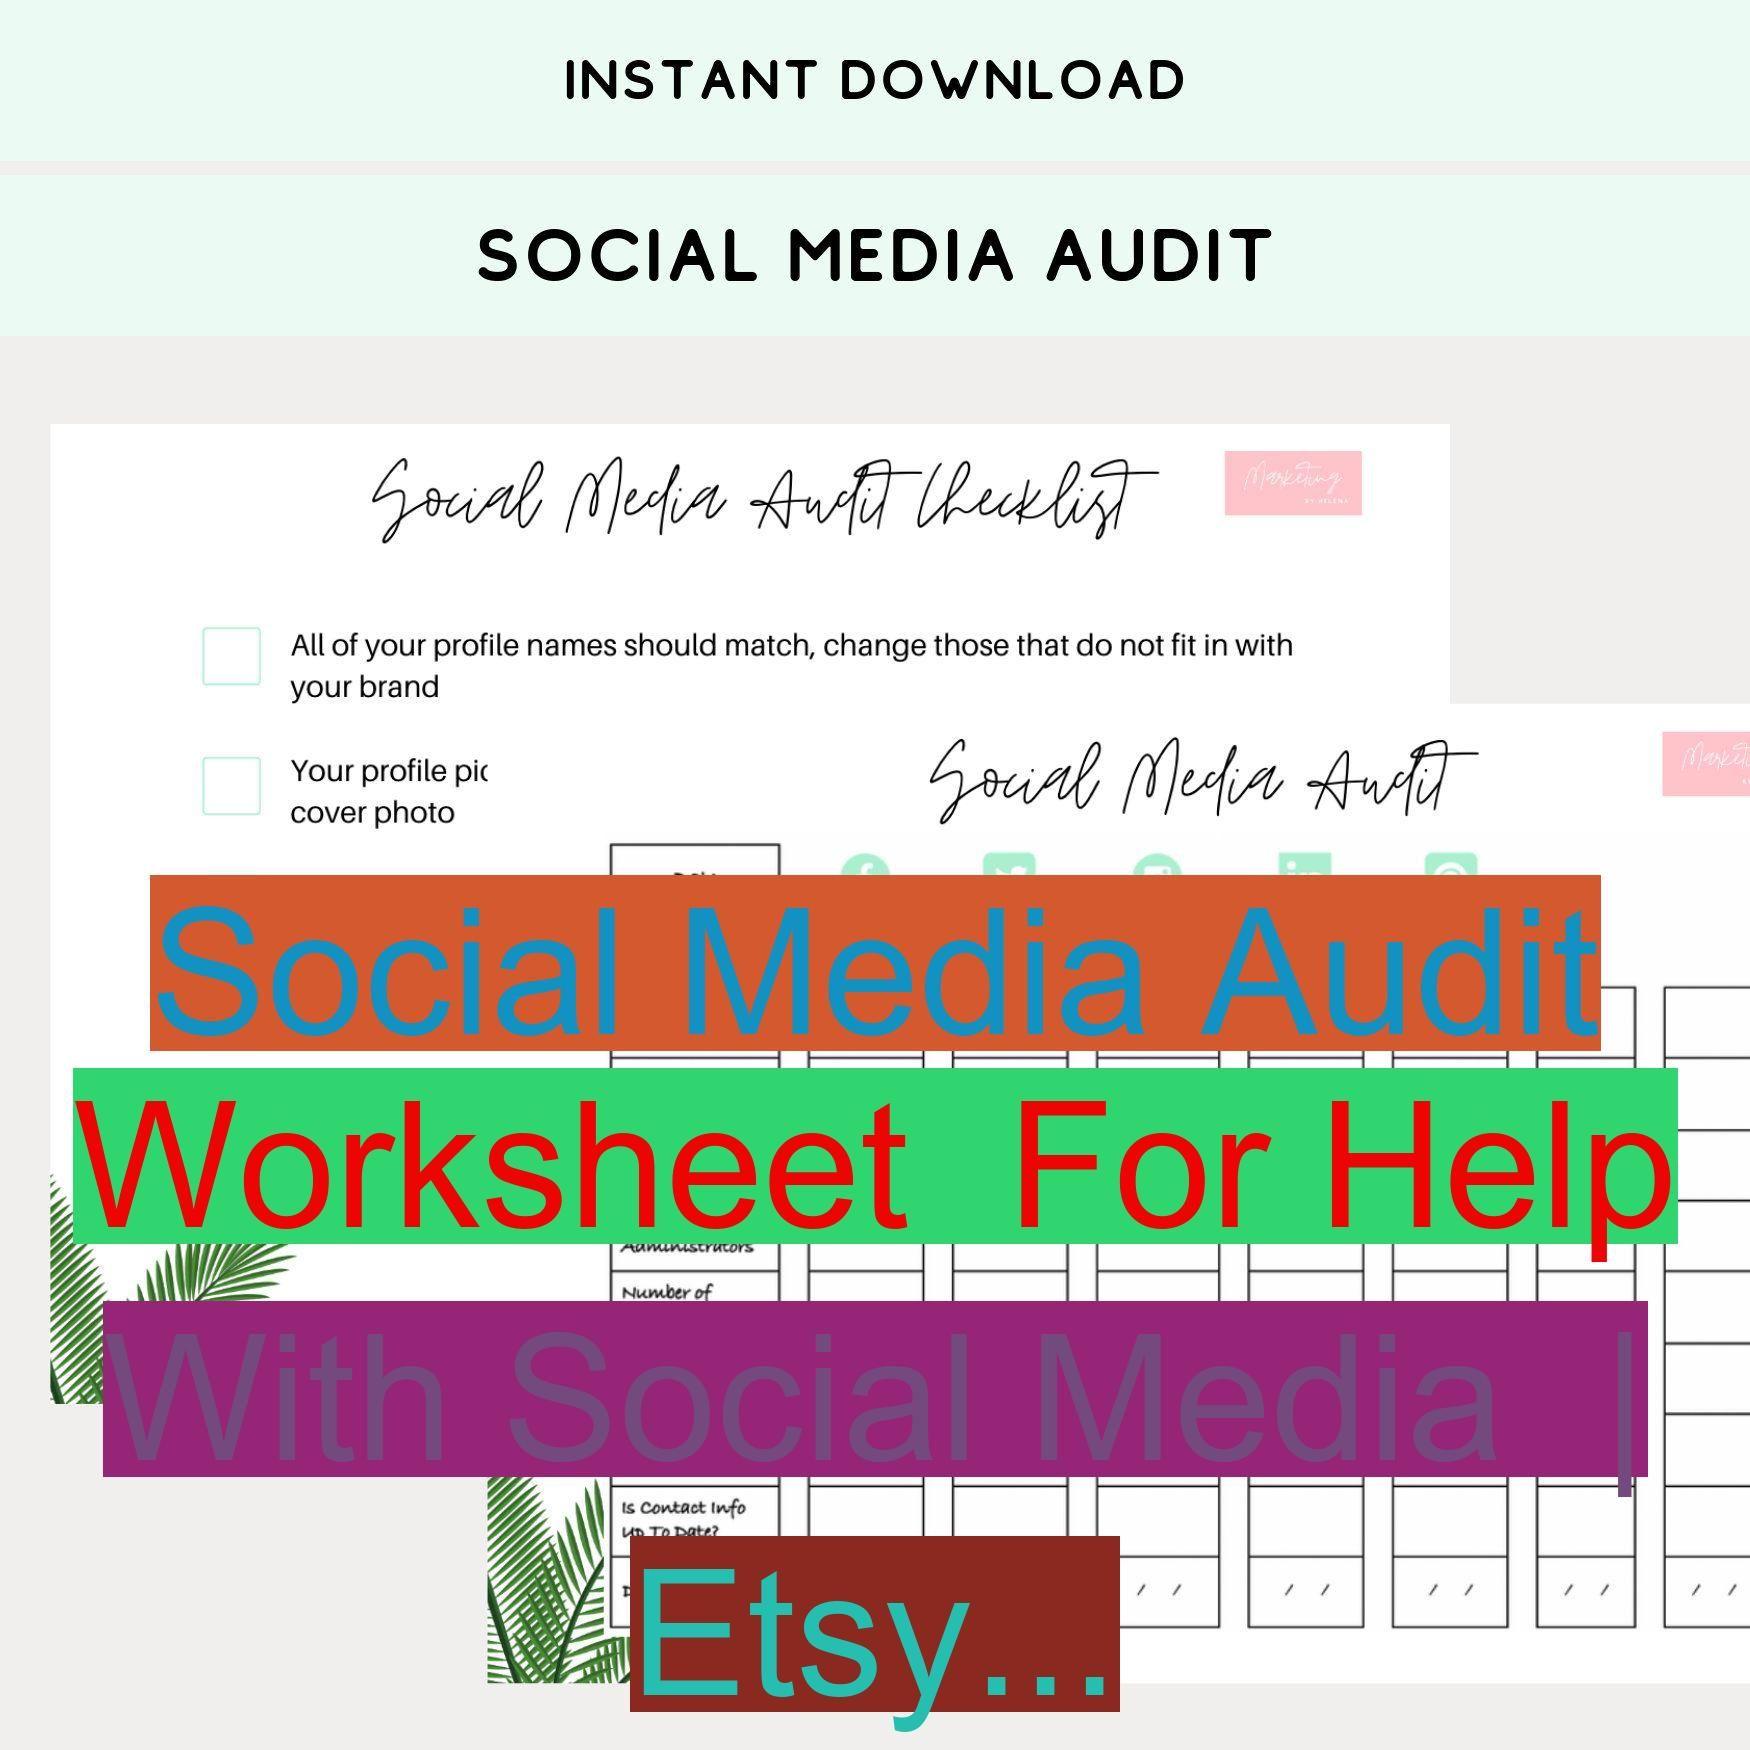 Social Media Audit Worksheet